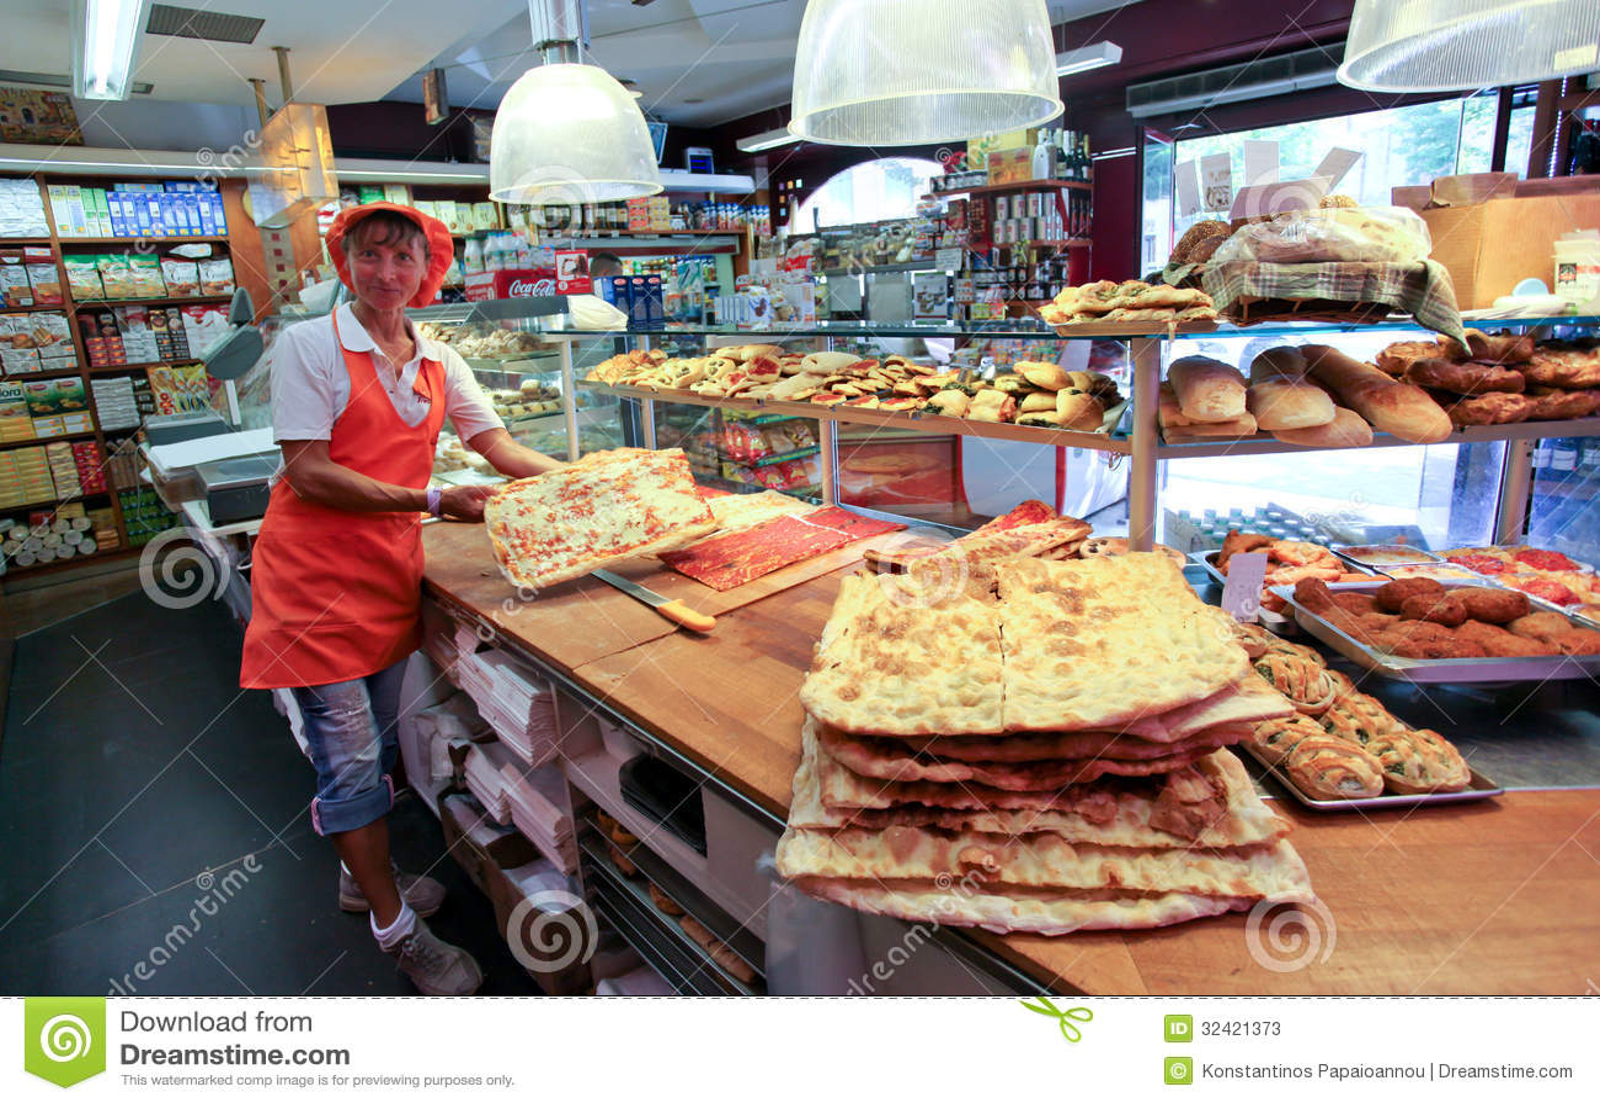 Best Food Market Rome